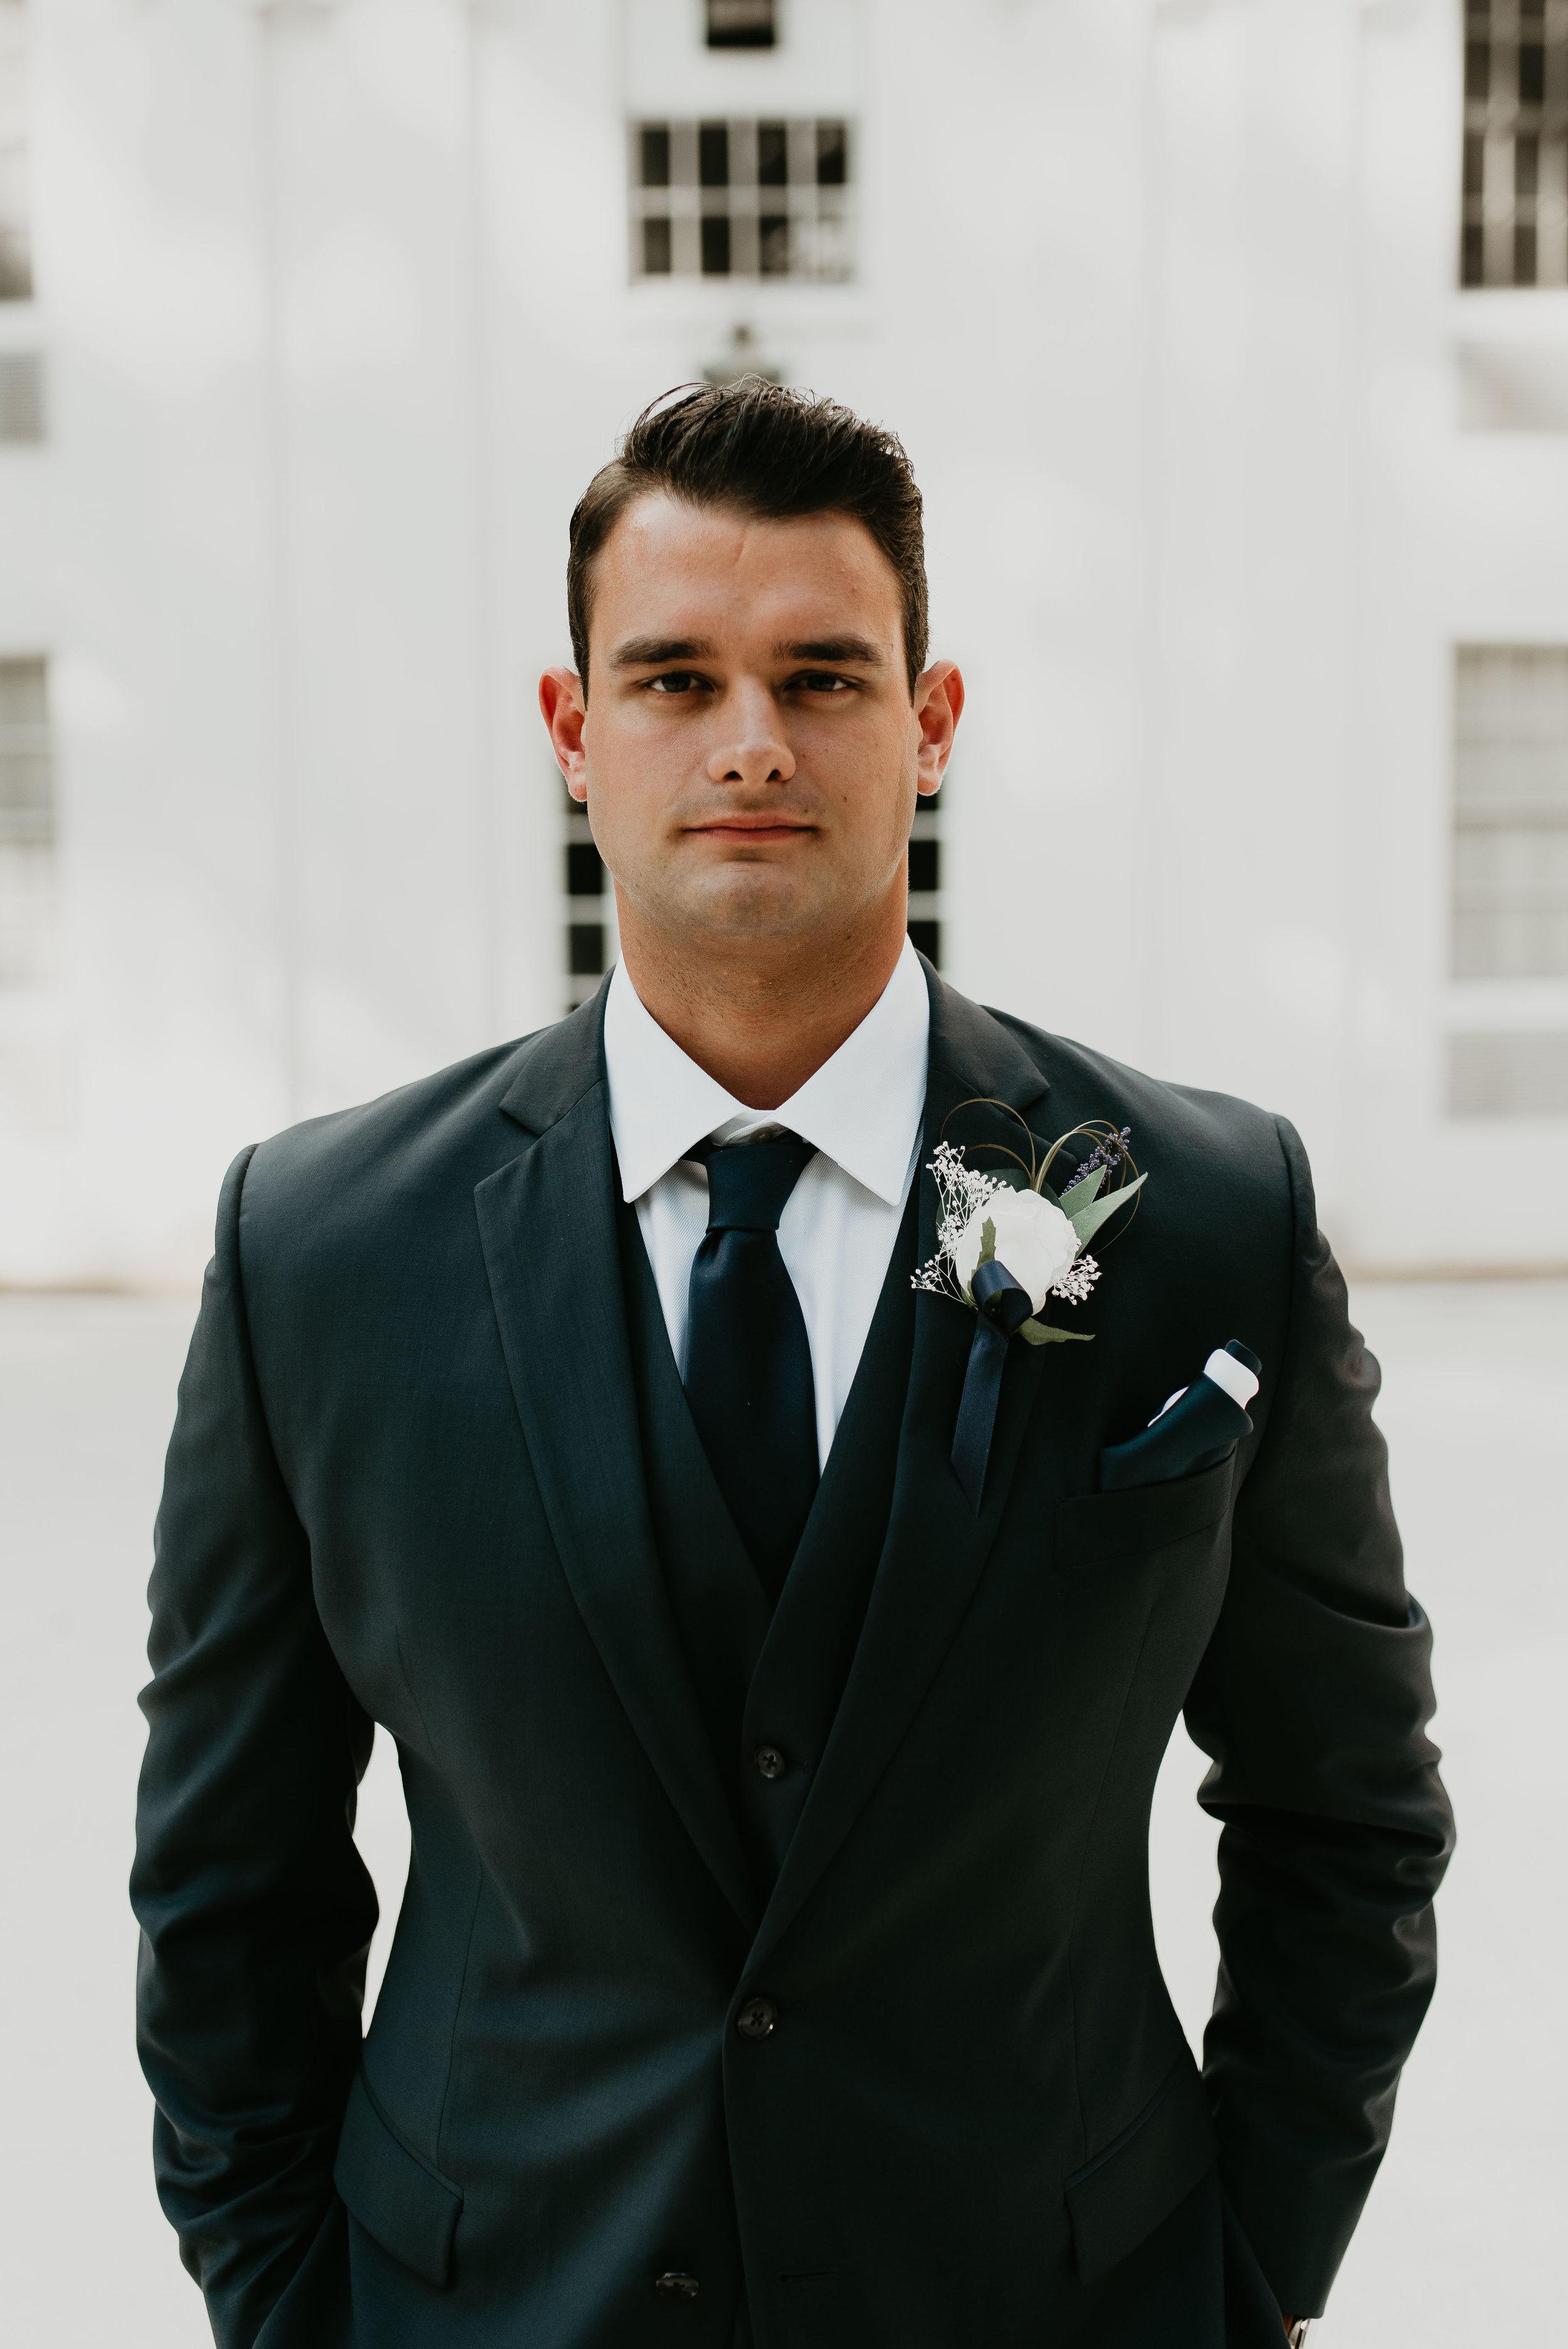 Portrait of groom in navy suit at Wesleyan College in Macon, GA